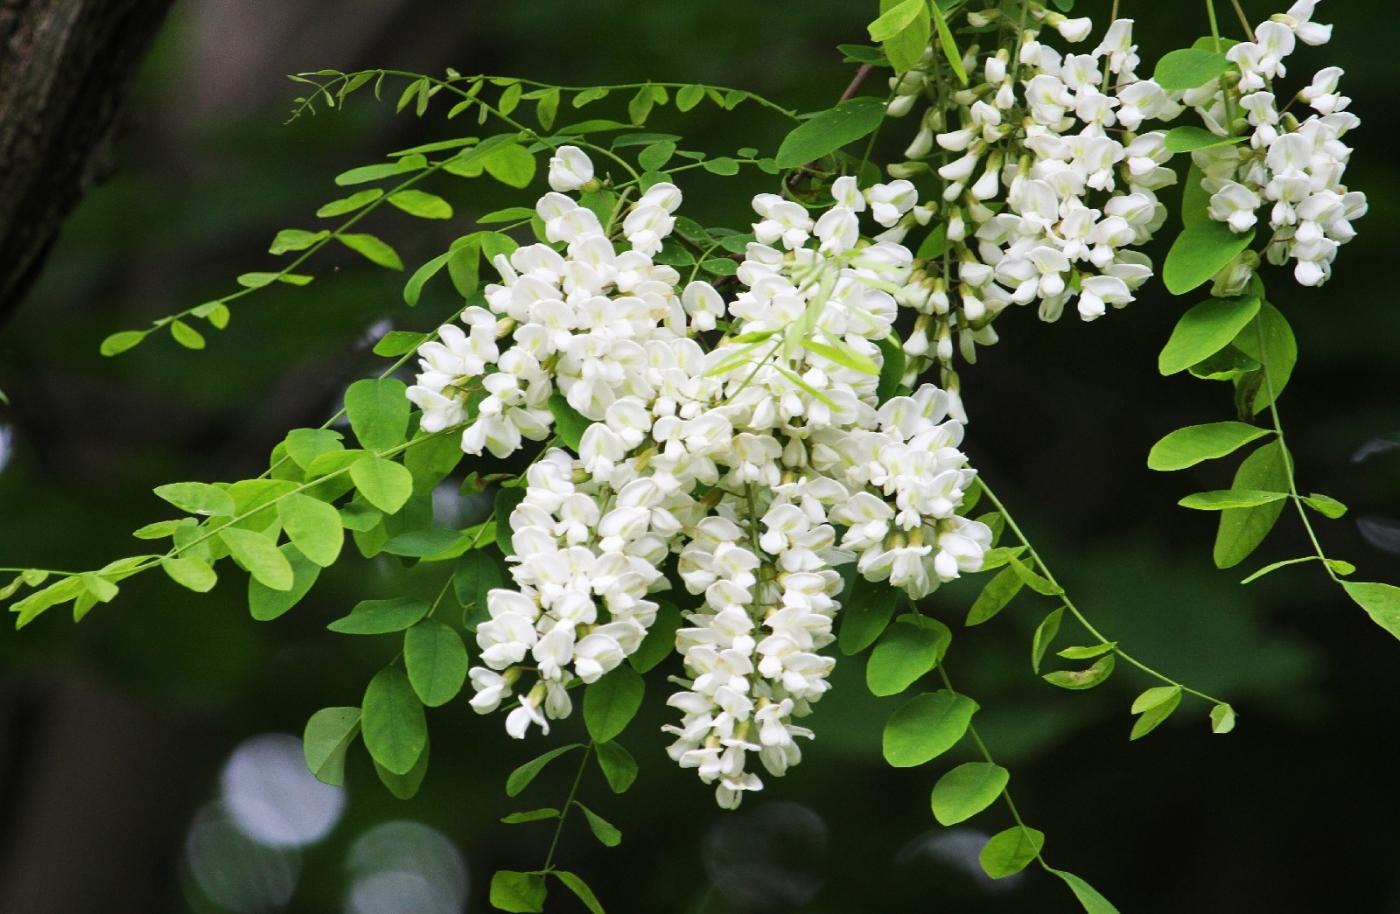 【田螺随拍】美国黄杨american yellowwood_图1-10